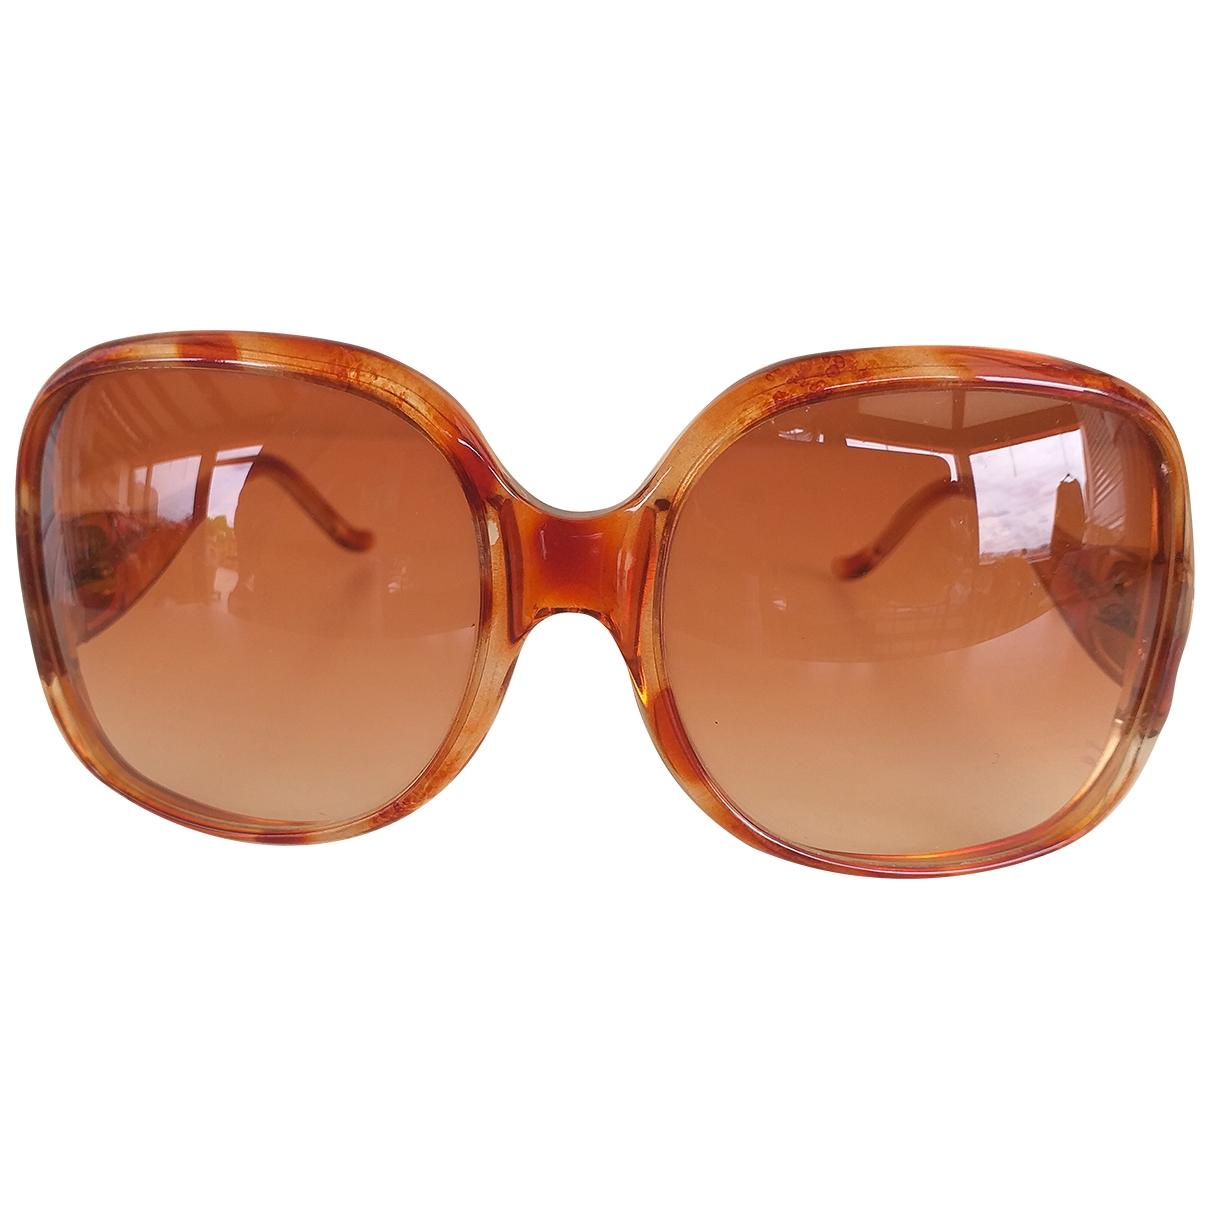 Balenciaga \N Orange Sunglasses for Women \N